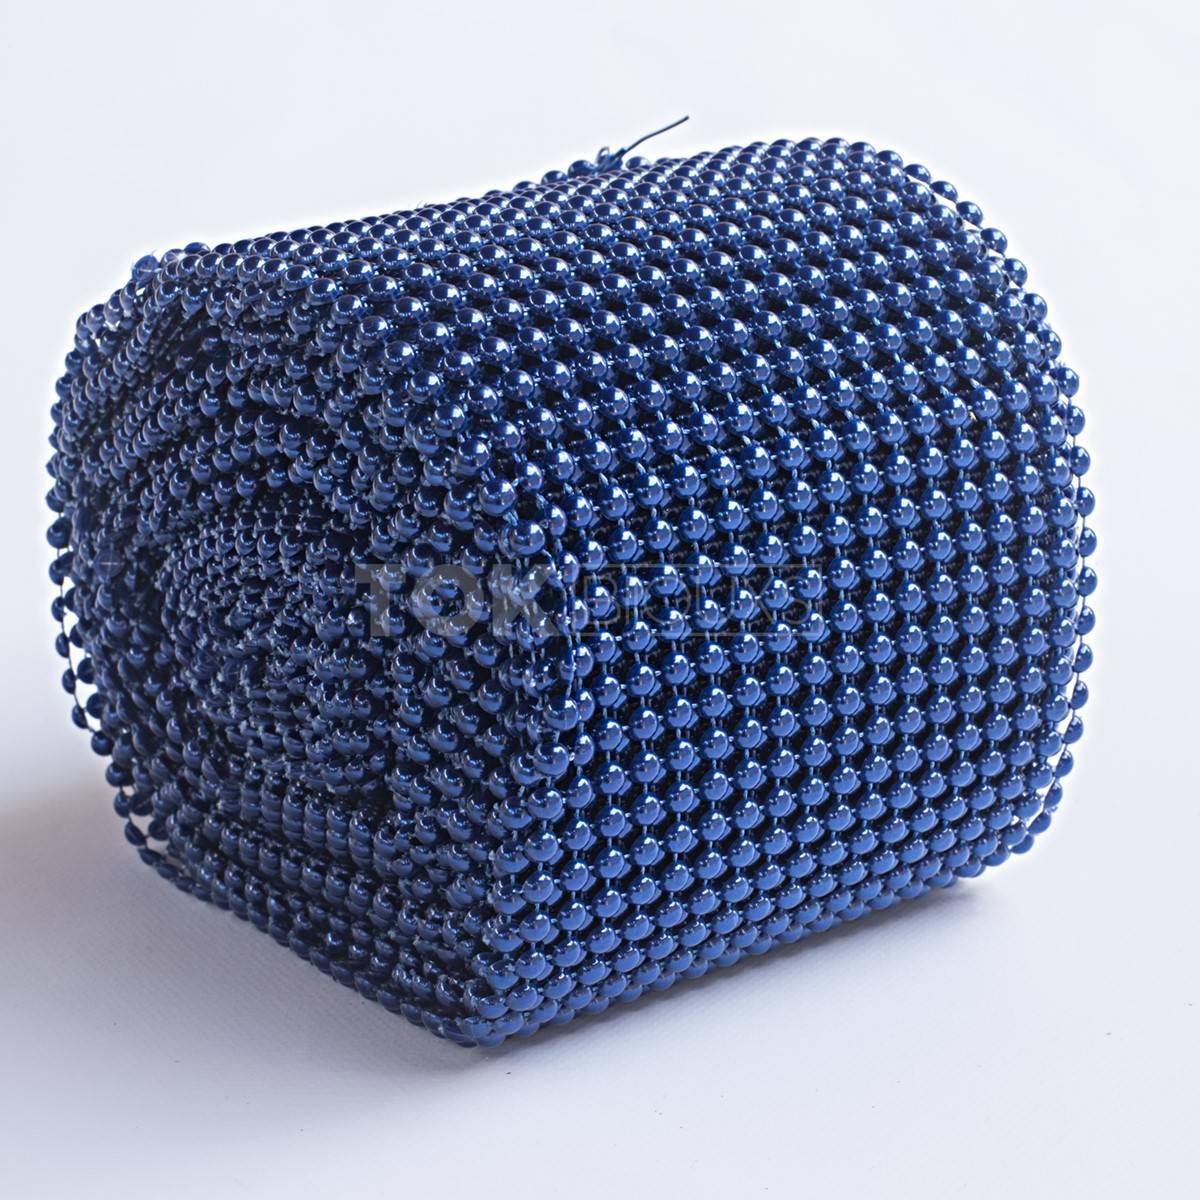 Manta Meia Pérola Abs - 6mm - Azul Royal - 9,14 Metros